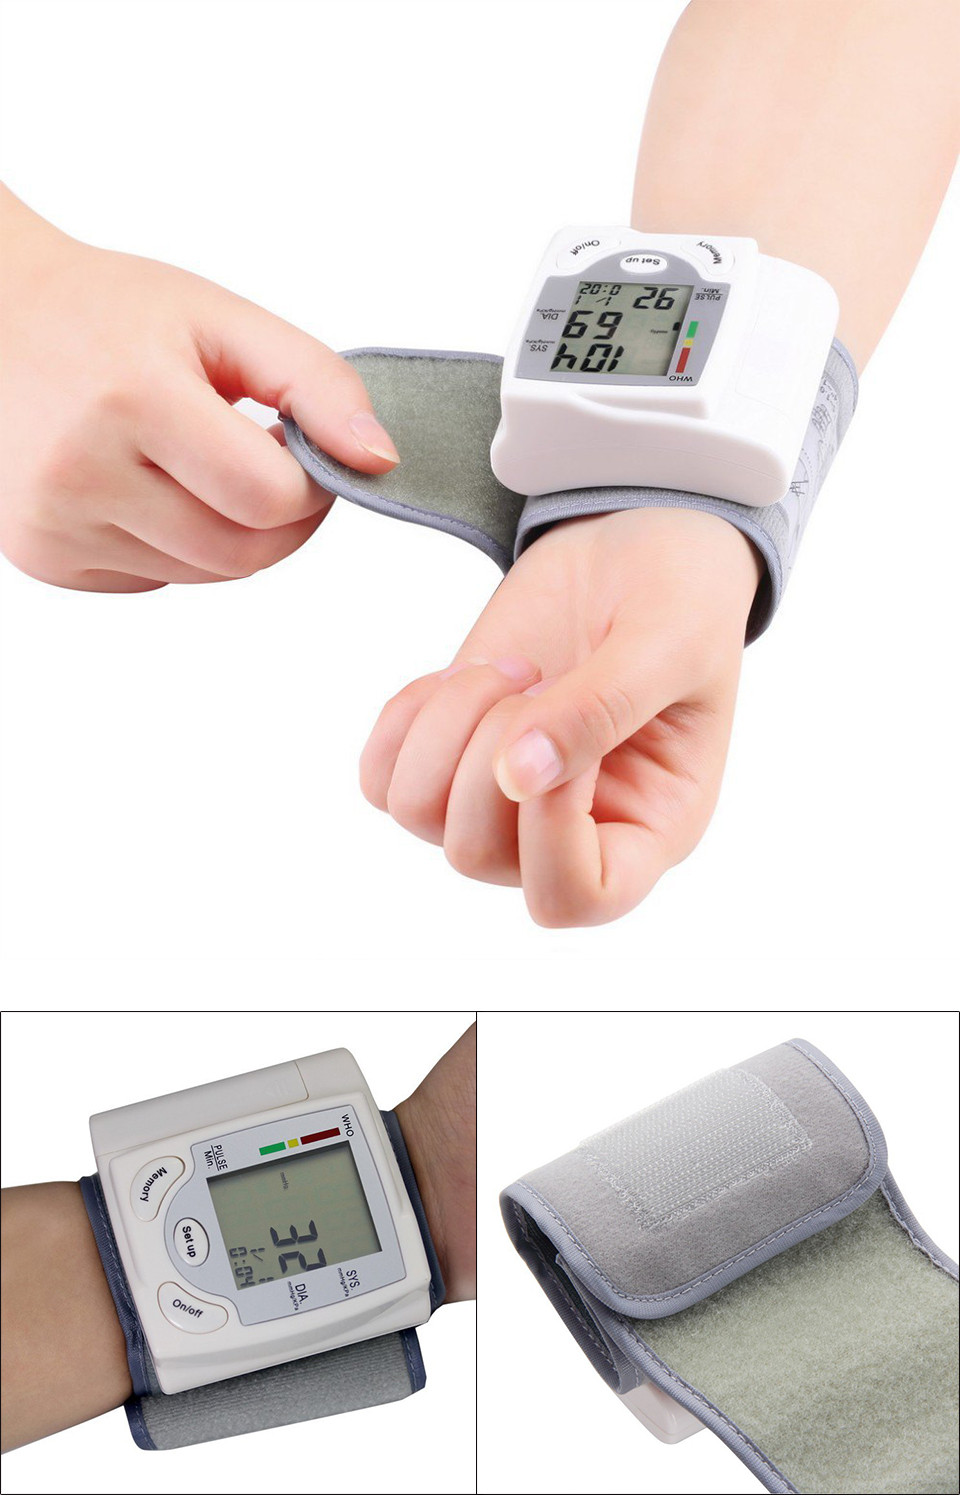 Gustala Automatic Digital Sphygmomanometer Wrist Cuff Arm Blood Pressure Monitor Meter Gauge Measure Portable Bracelet Device 19